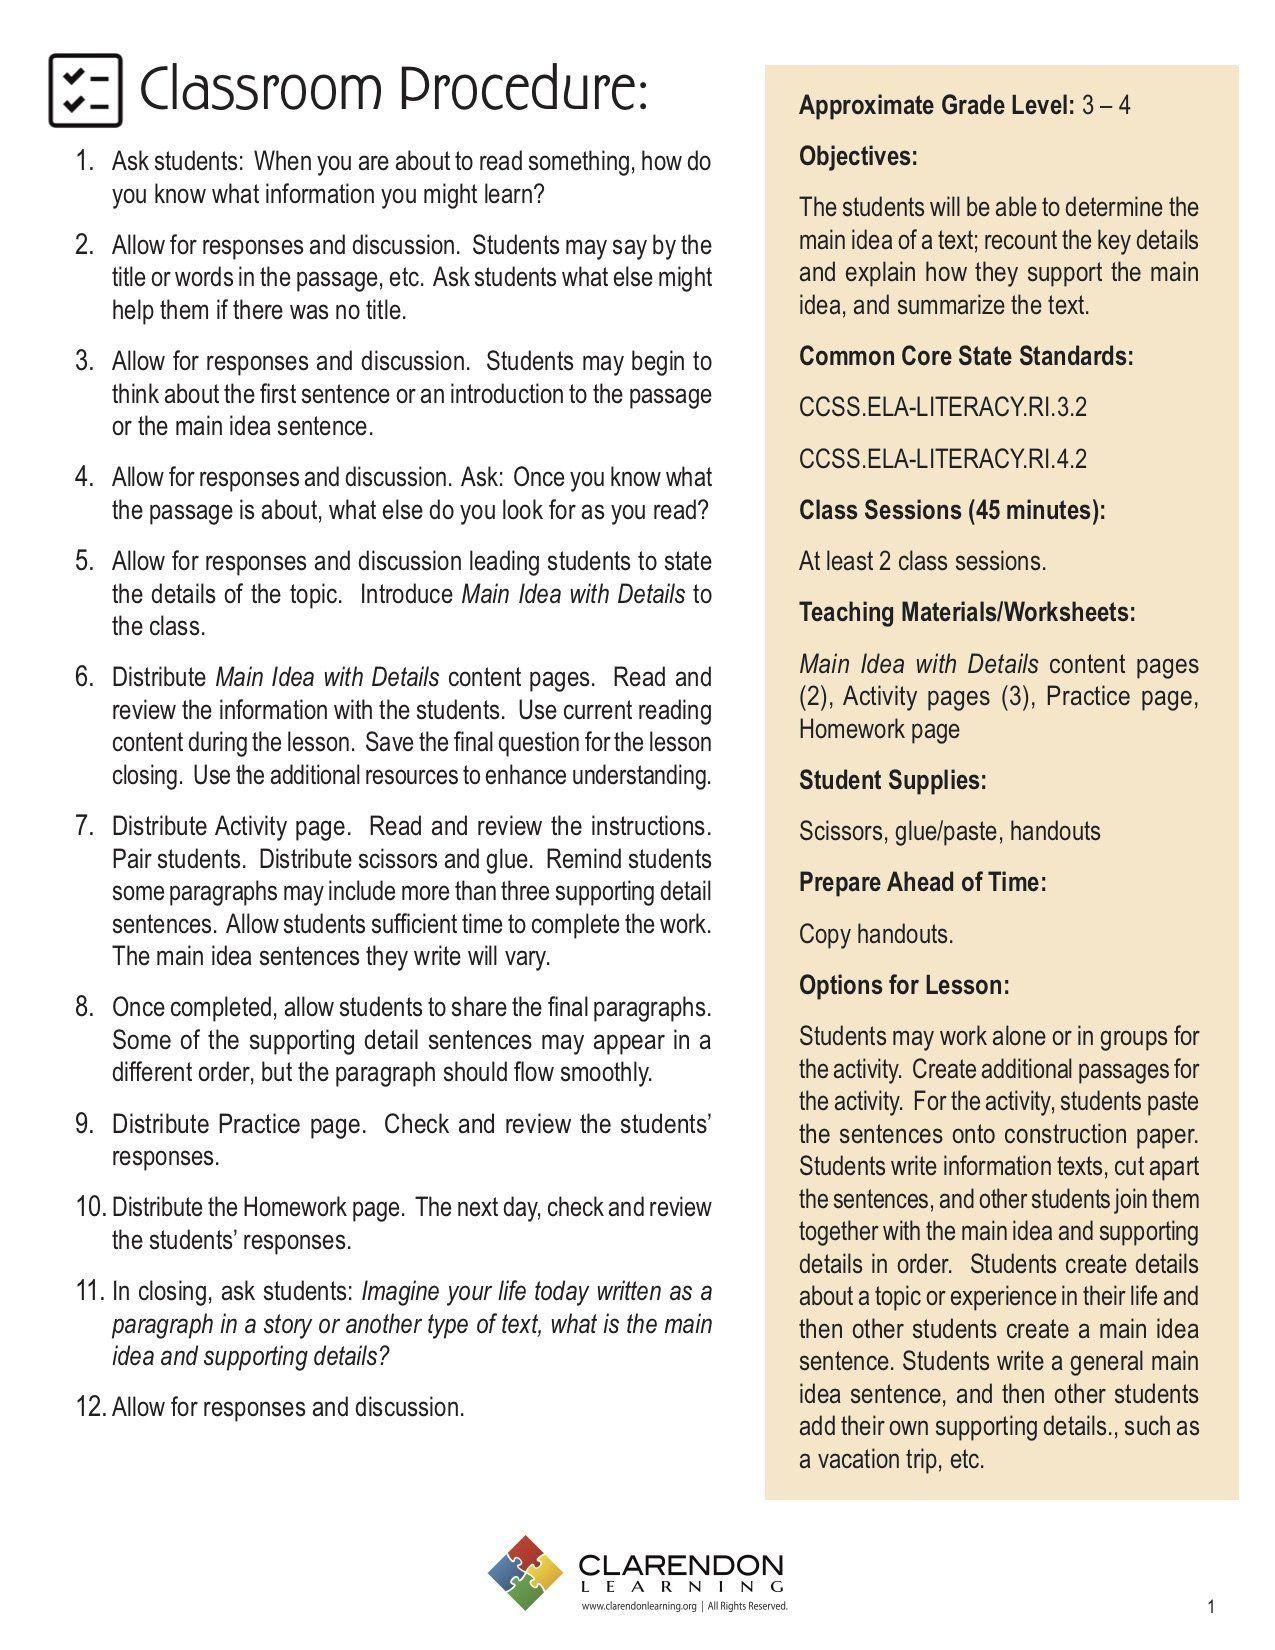 3rd Grade Main Idea Worksheets Main Idea With Details